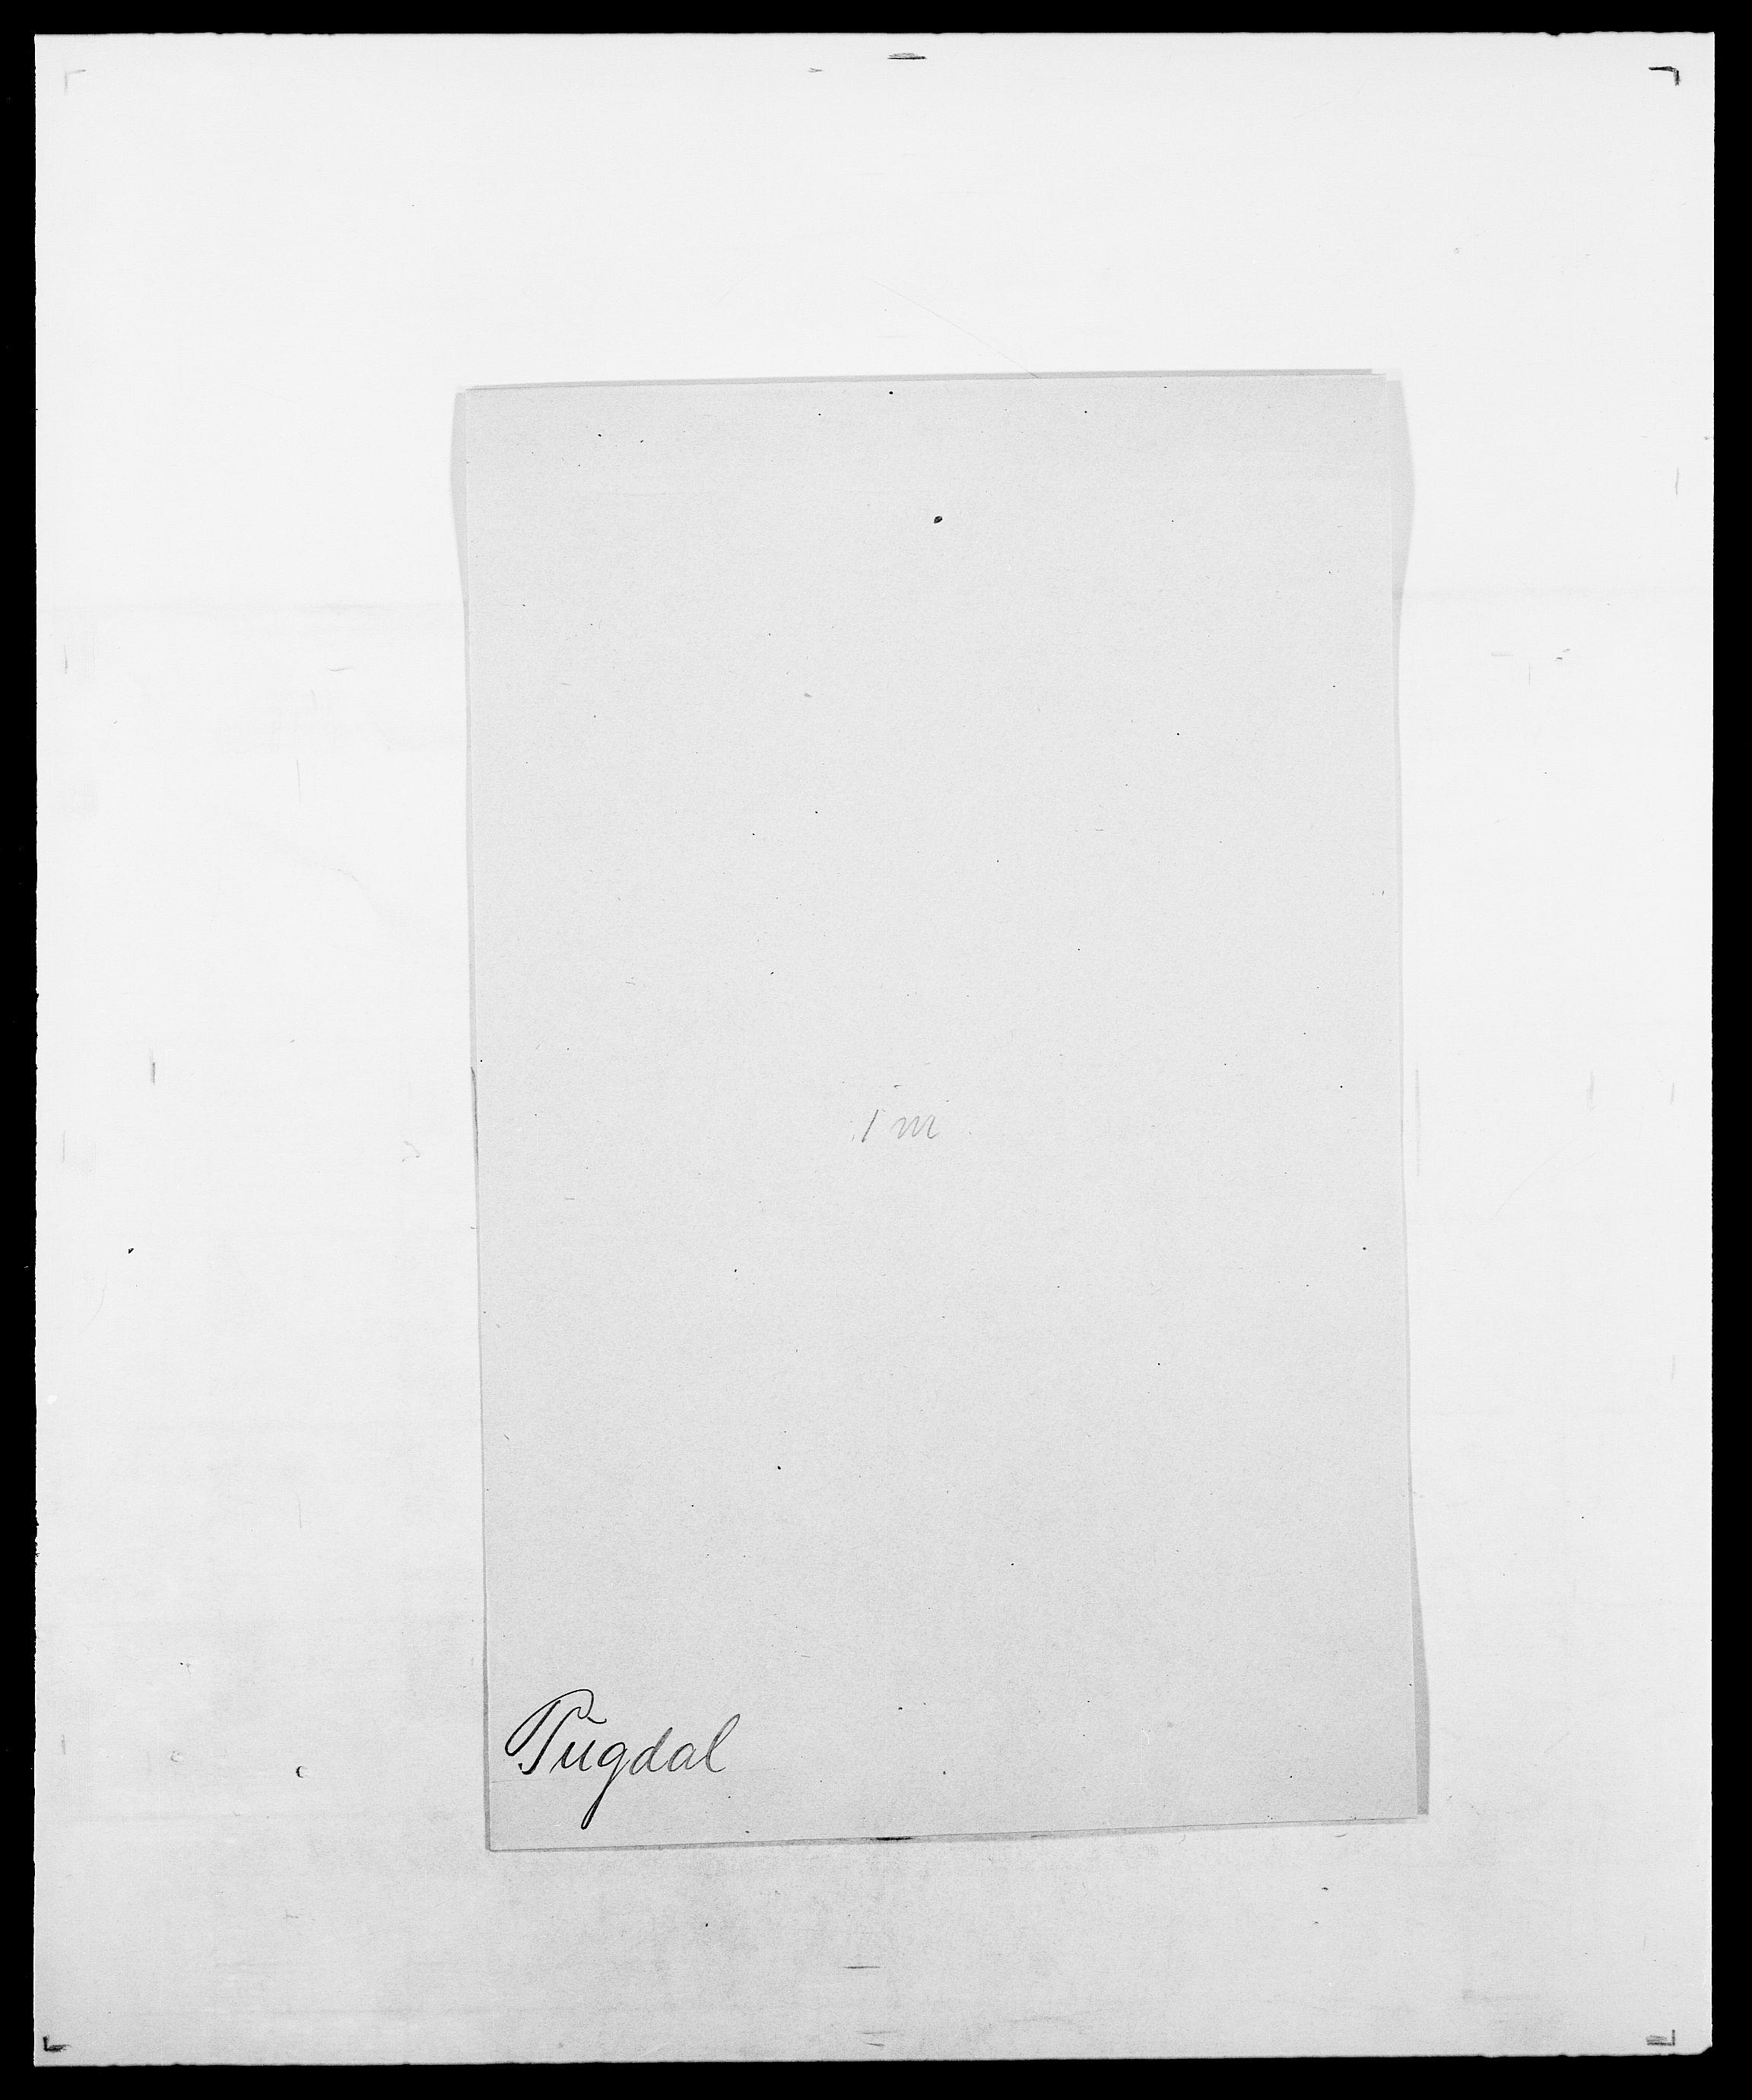 SAO, Delgobe, Charles Antoine - samling, D/Da/L0031: de Place - Raaum, s. 432